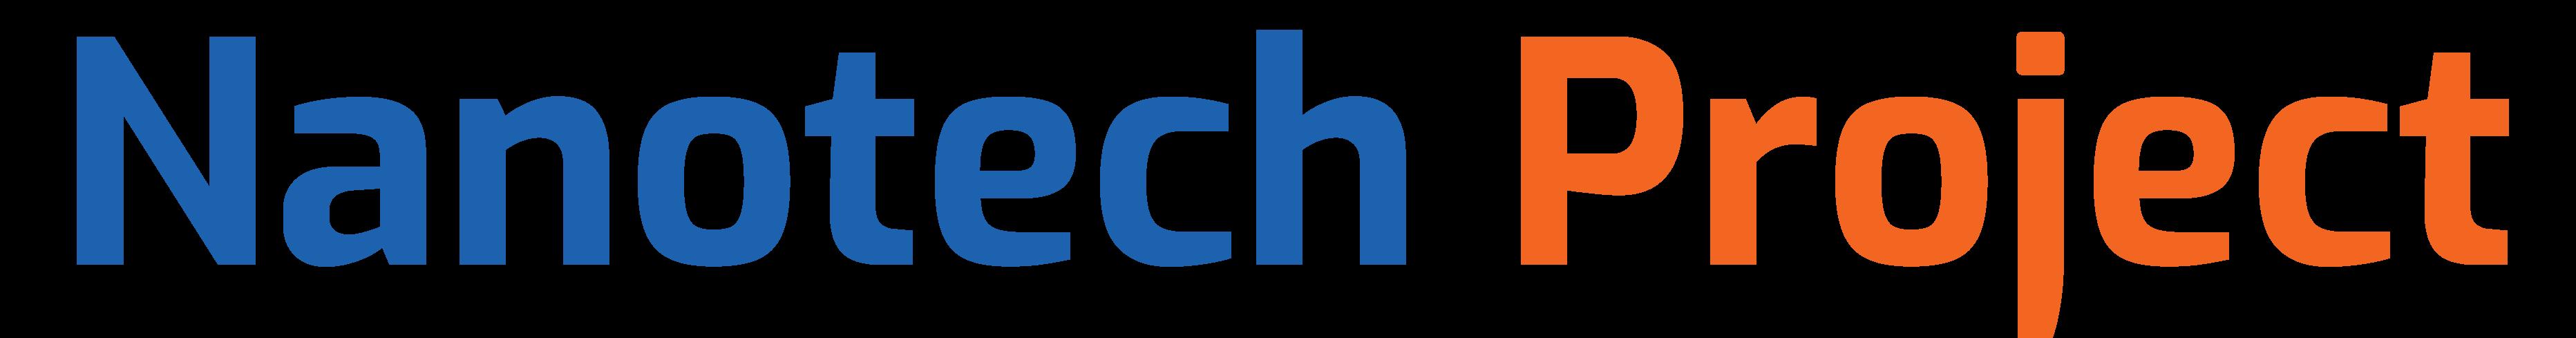 Nanotech Project